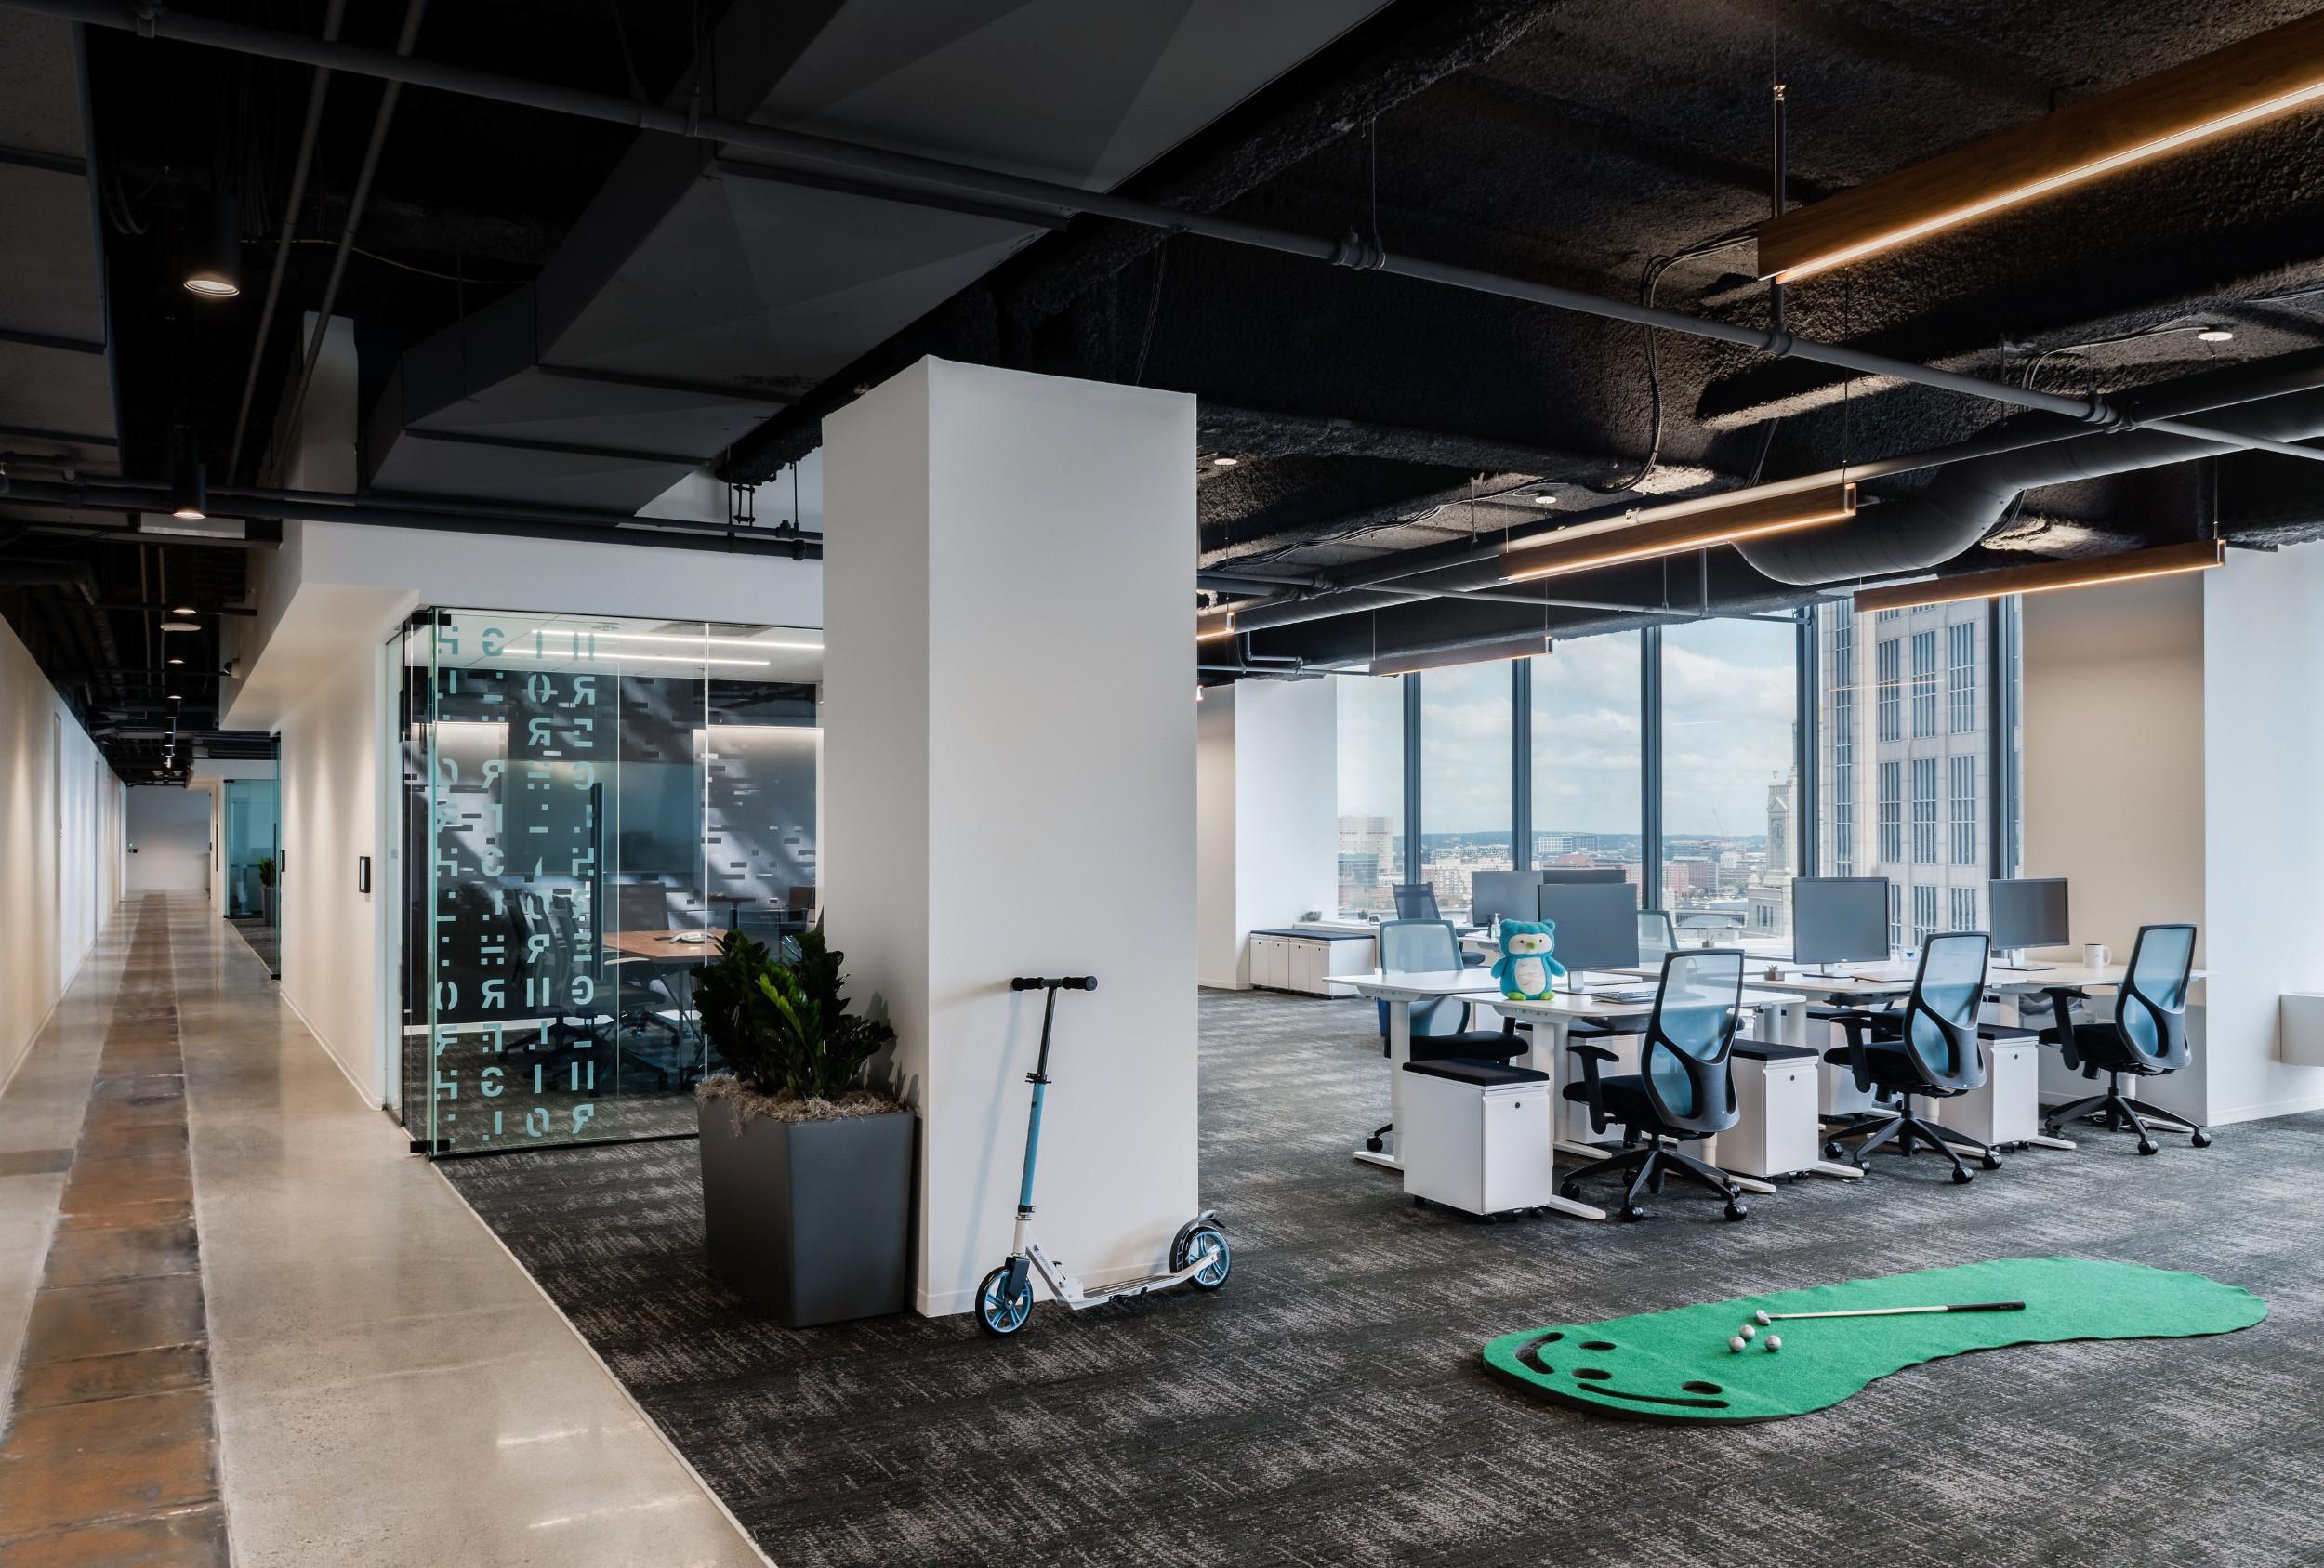 Corderman_Construction_Cybereason_Technology_Office_Boston_Interior_Buildout_Hallway.jpg